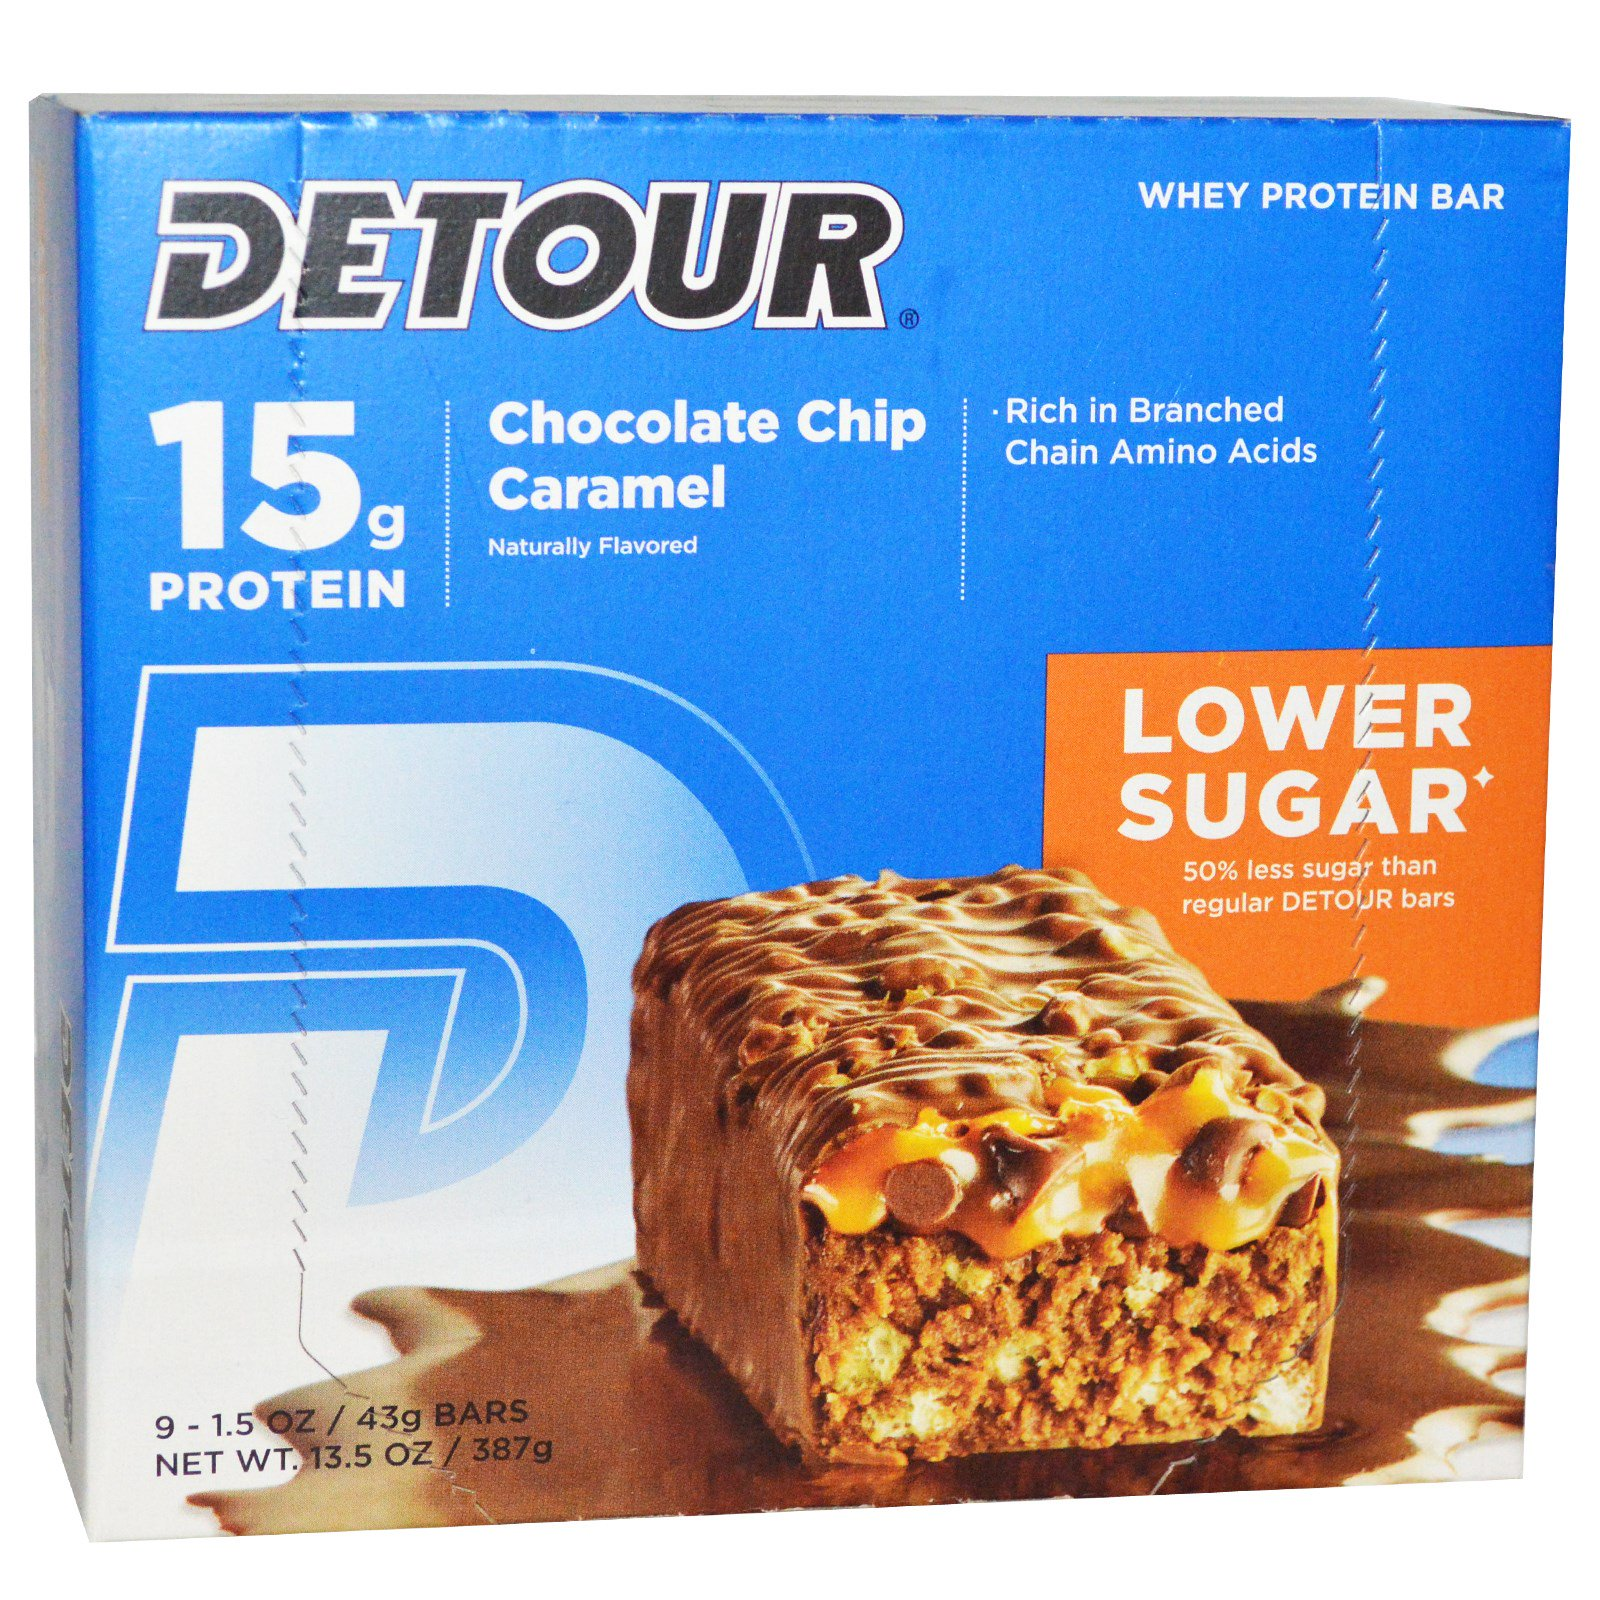 Detour, Whey Protein Bar, Chocolate Chip Caramel, 9 Bars,...